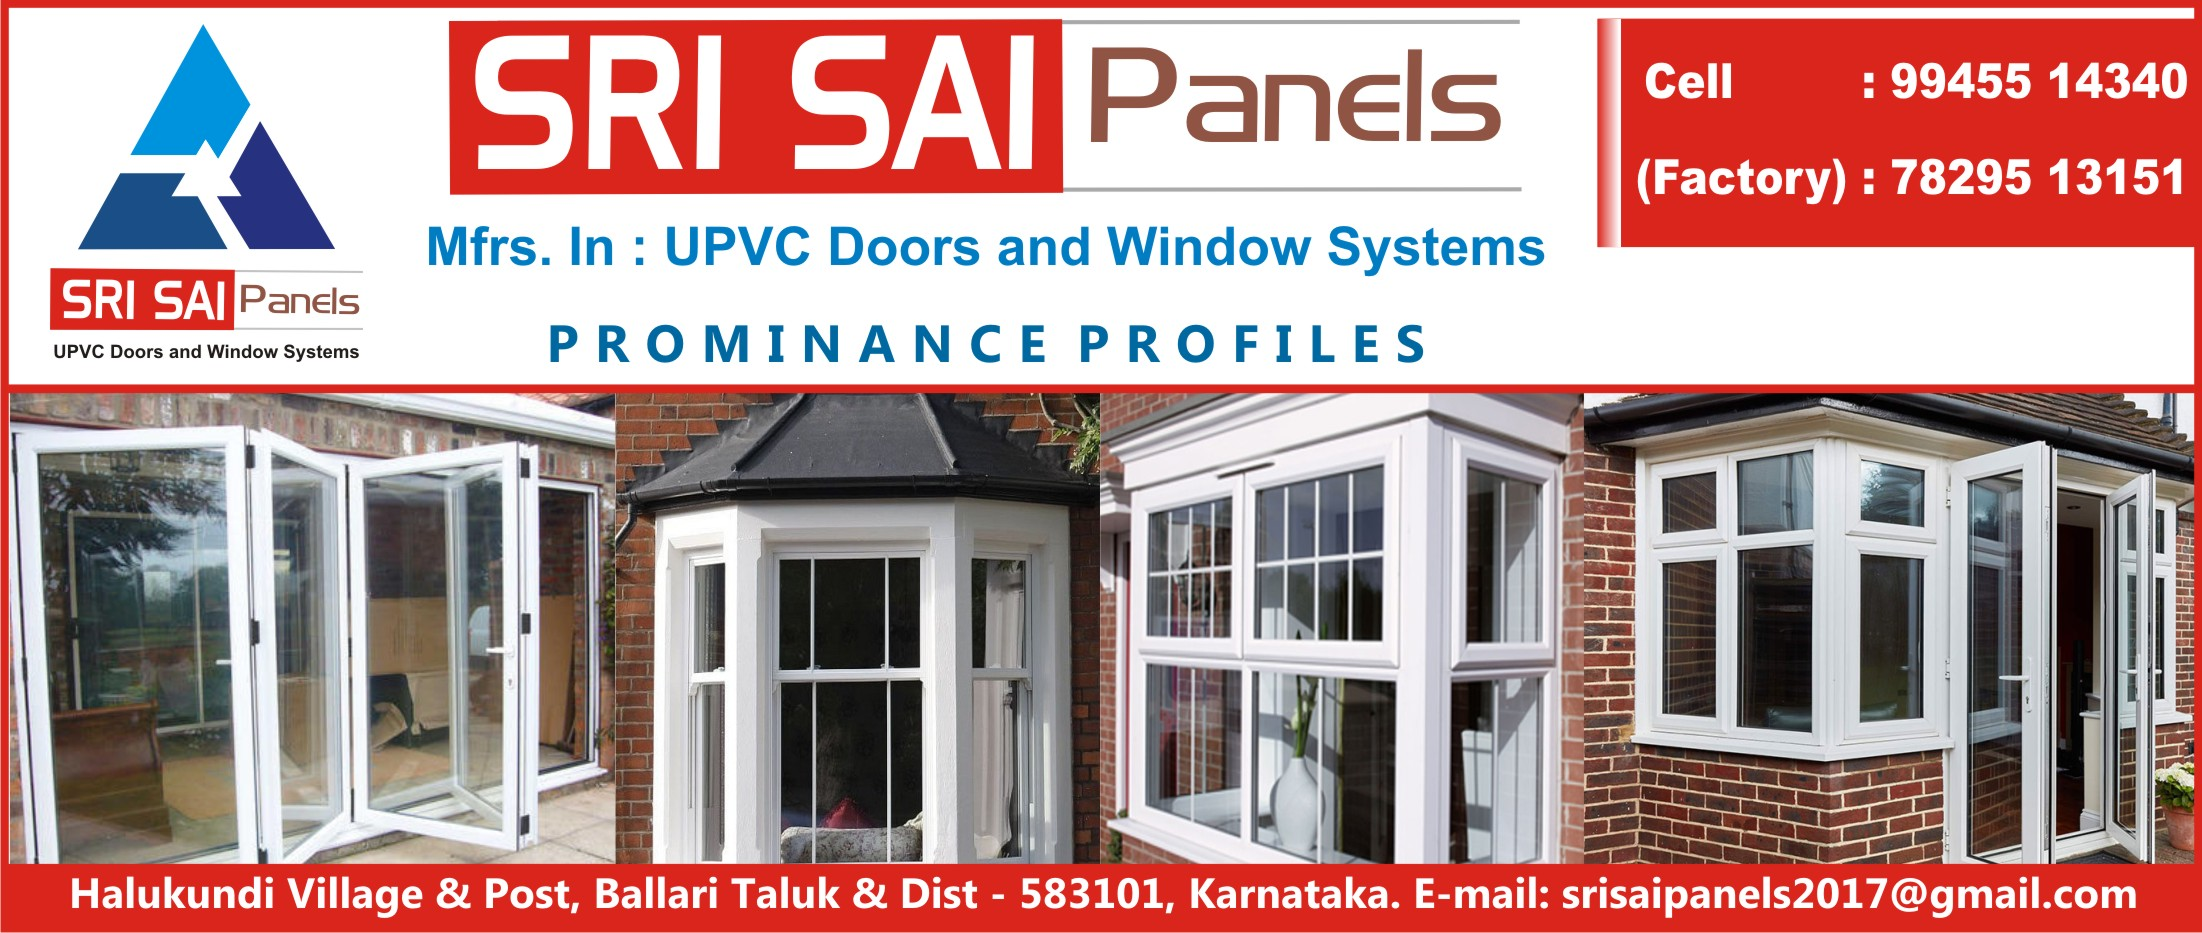 Sri Sai Panels